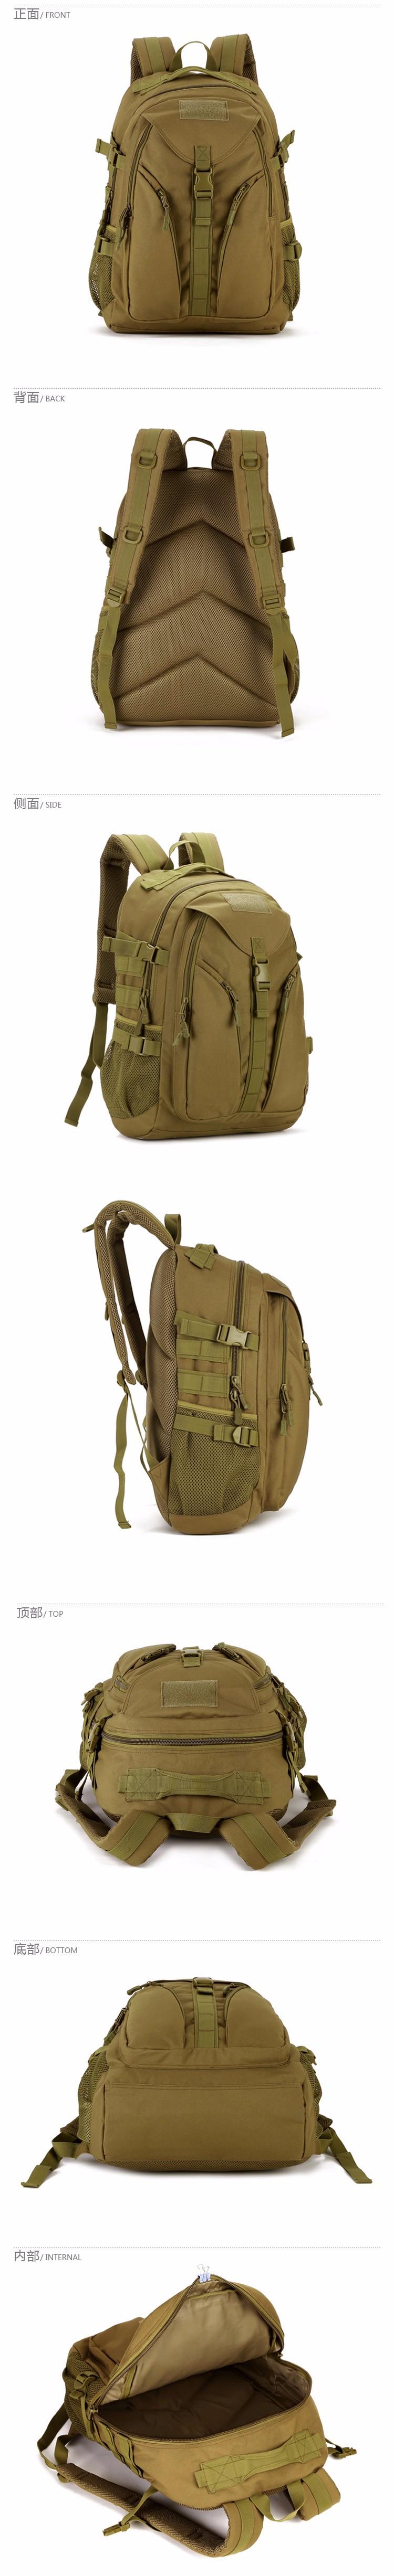 40L Waterproof Molle Backpacks Military 3P Tactics Rackpack Assault Nylon Travel Rucksack Bag for Men Women Rucksack Bag 8